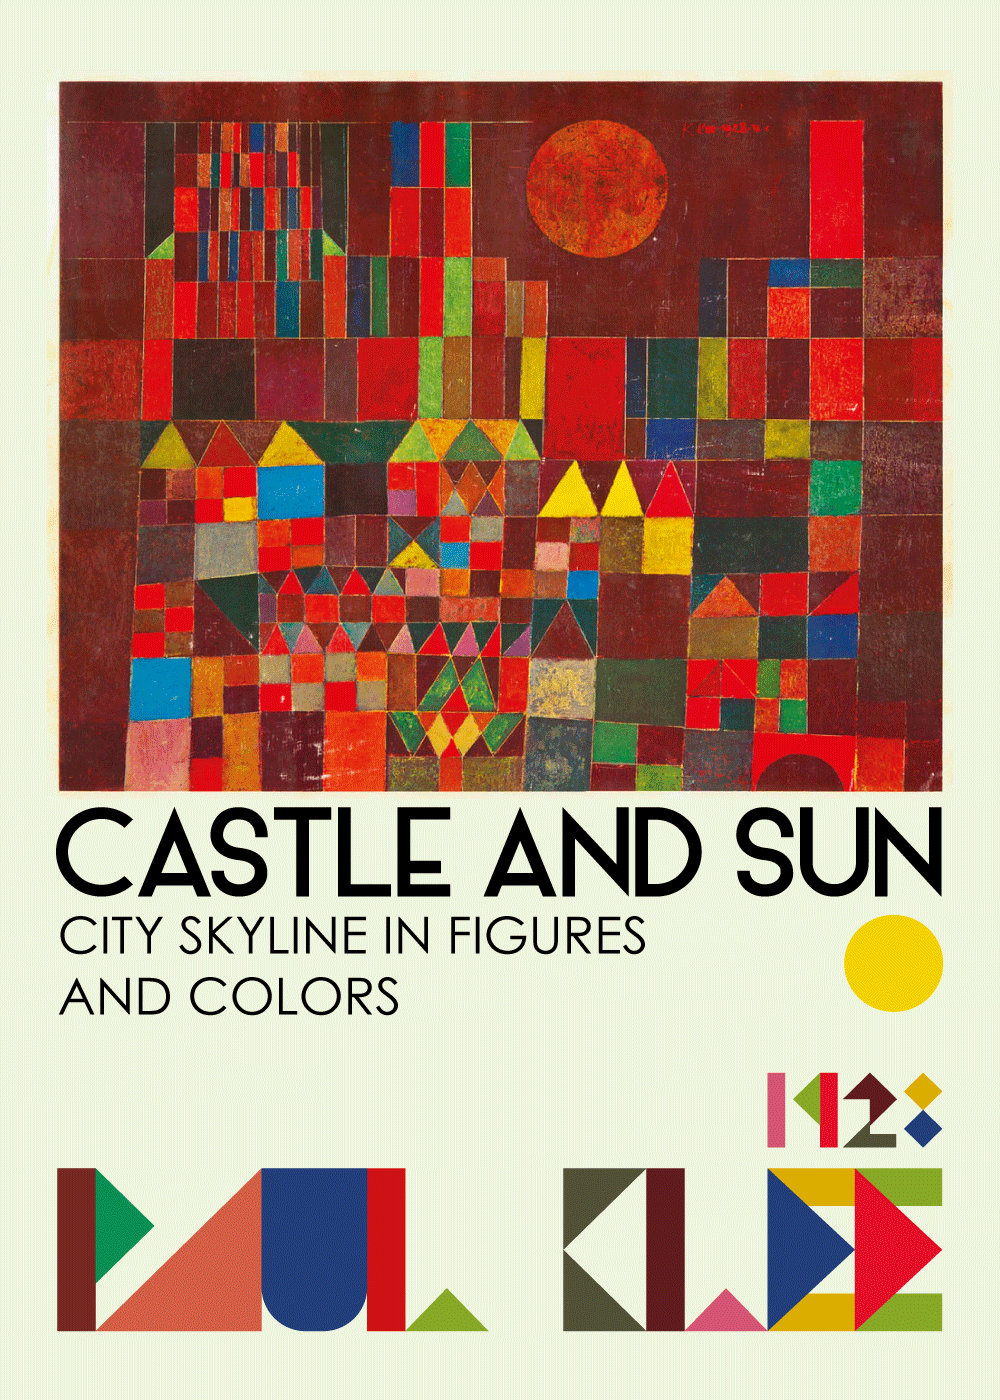 Castle and sun - Paul Klee kunstplakat